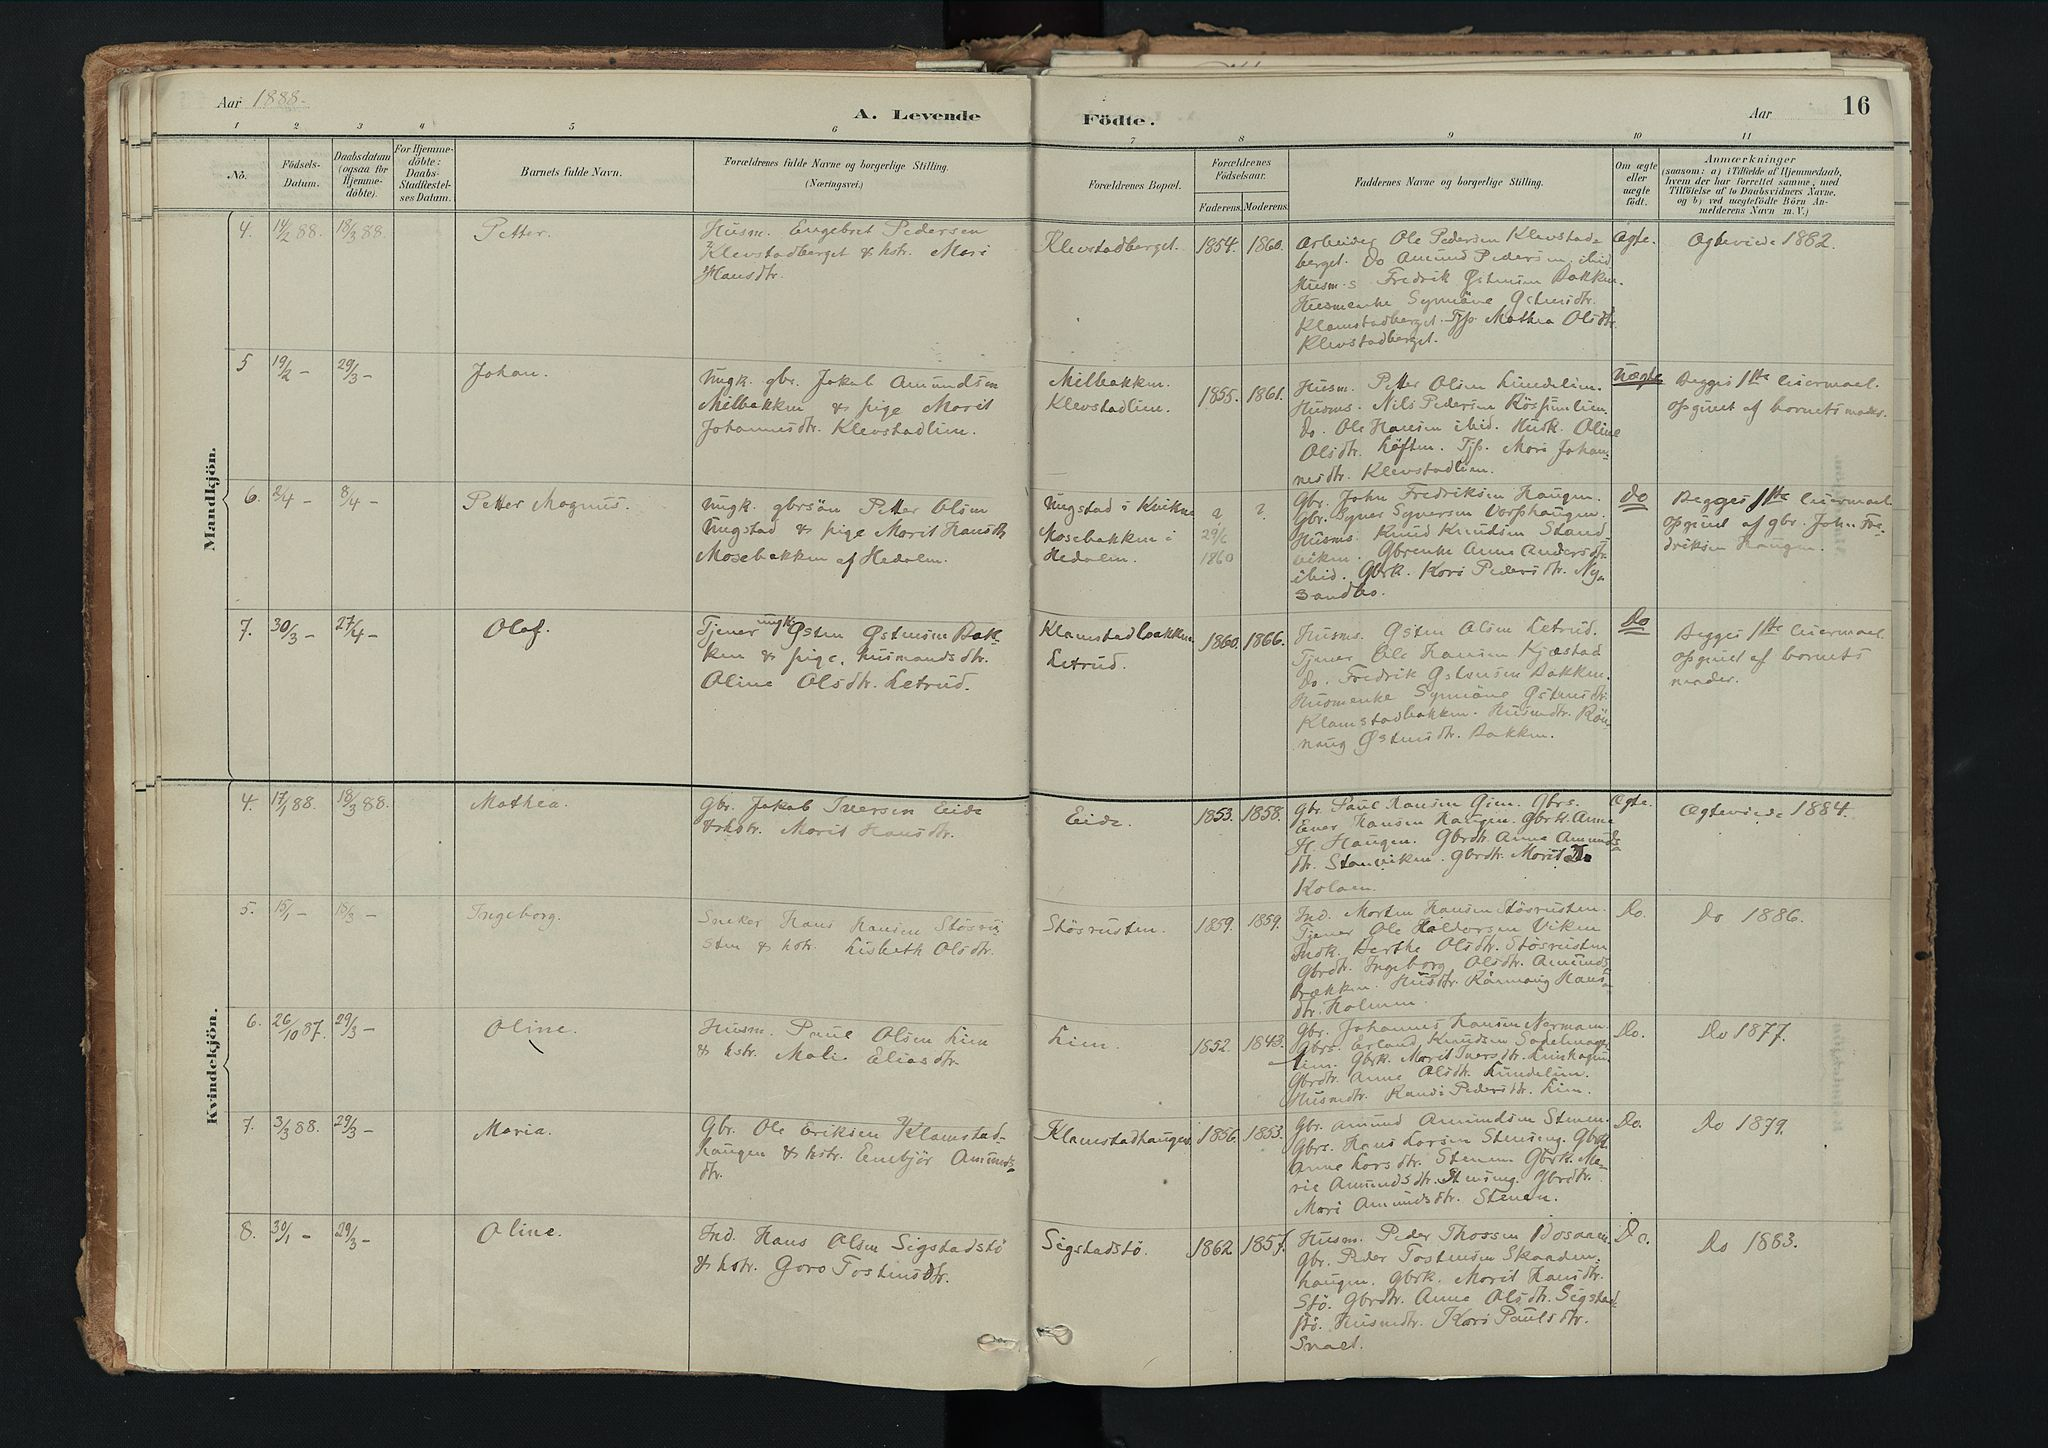 SAH, Nord-Fron prestekontor, Ministerialbok nr. 3, 1884-1914, s. 16